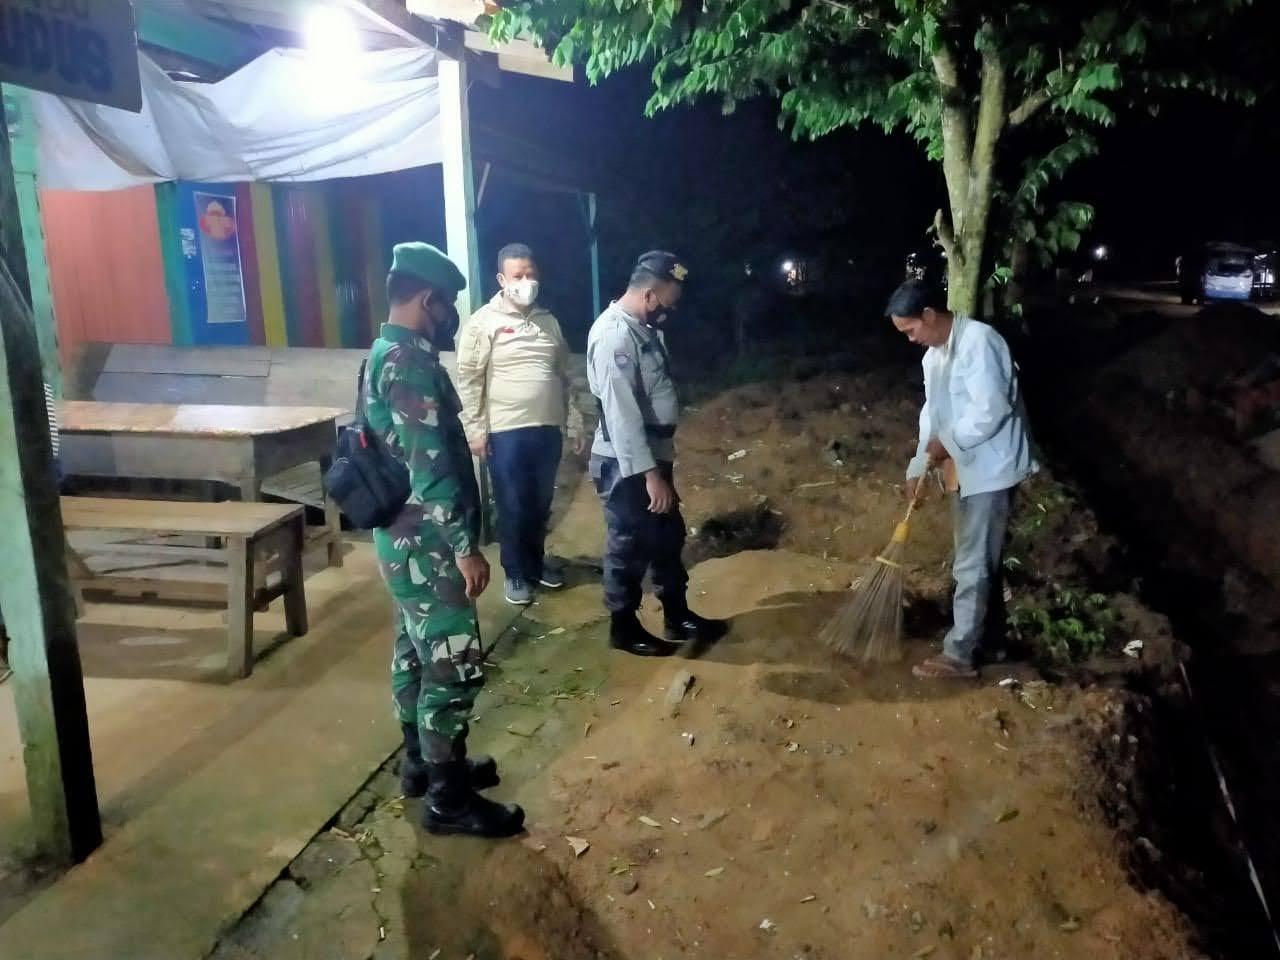 Antisipasi Pelanggaran Prokes, Tiga Pilar Aruta Laksanakan Operasi Yustisi